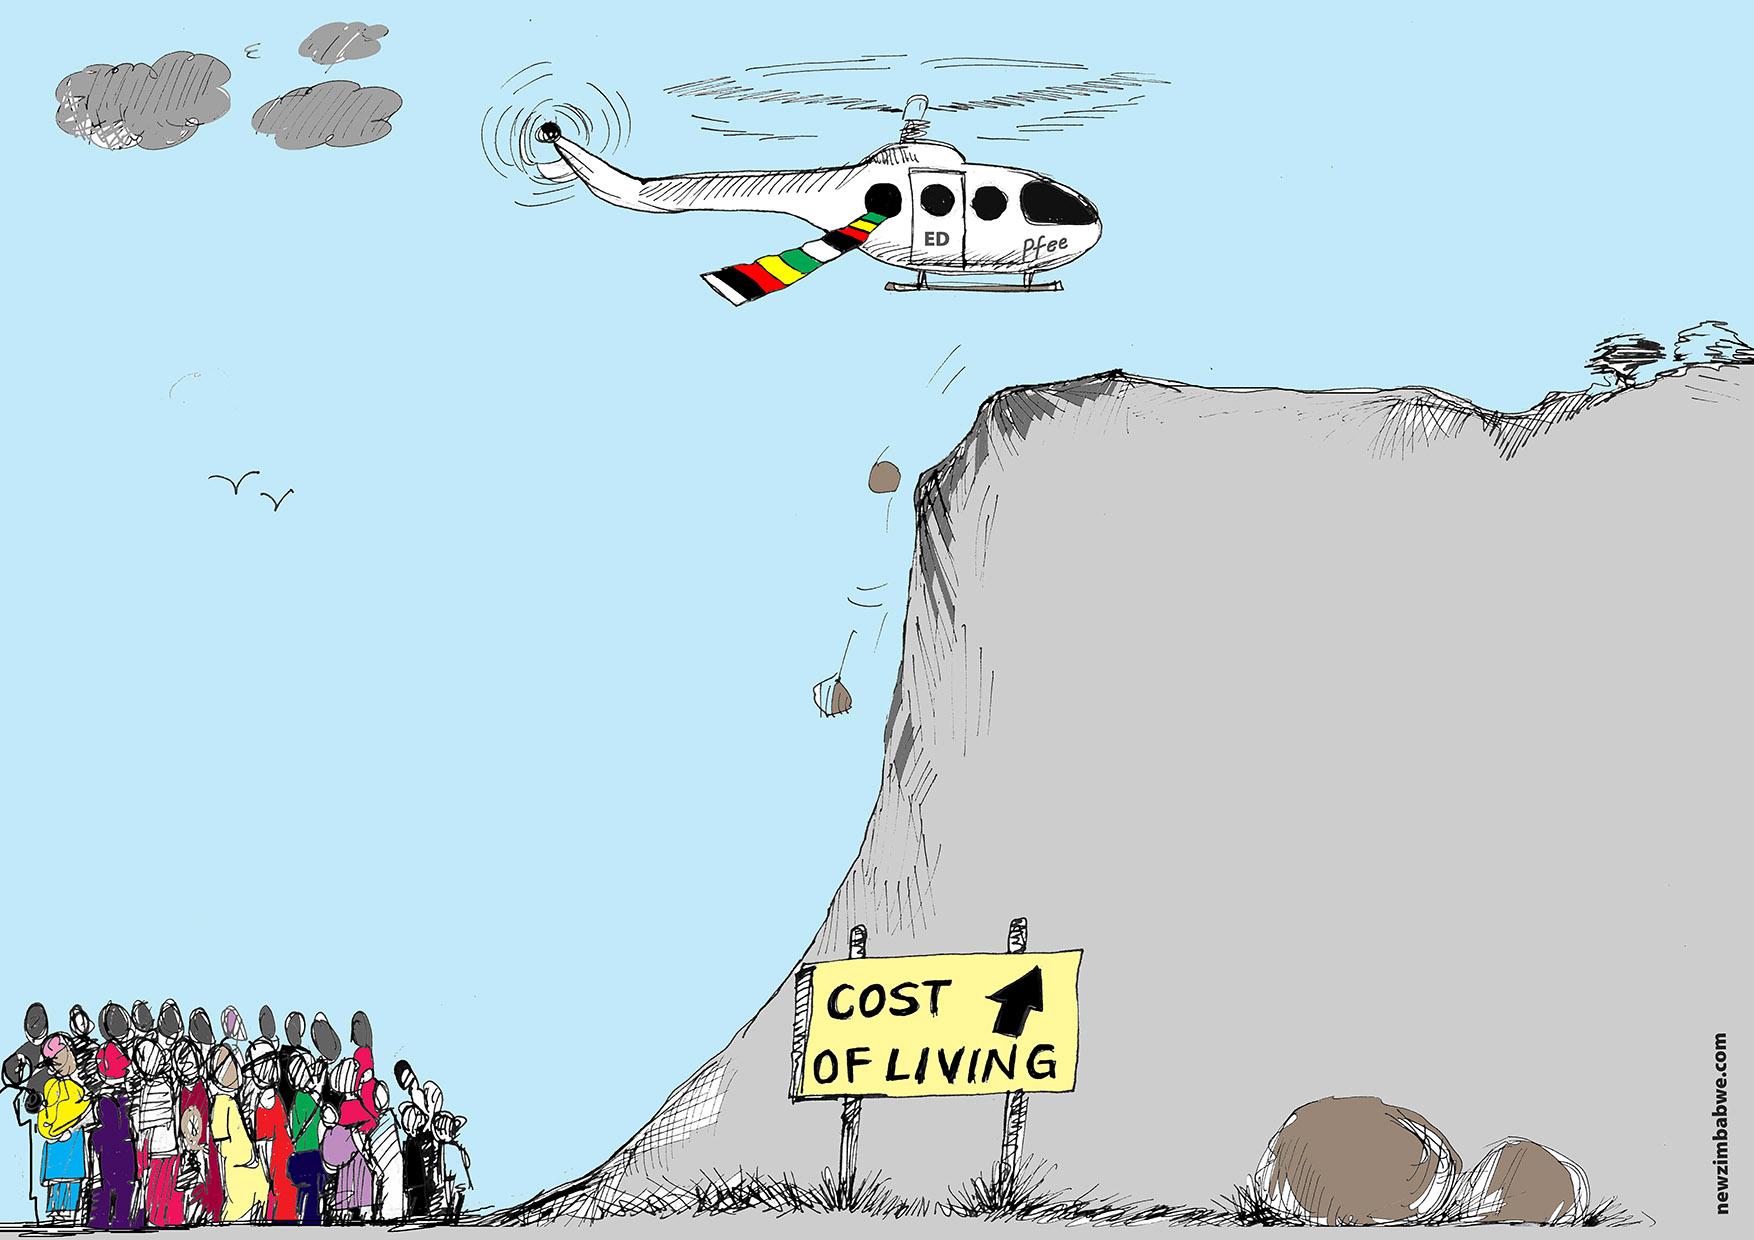 Zim cost of living